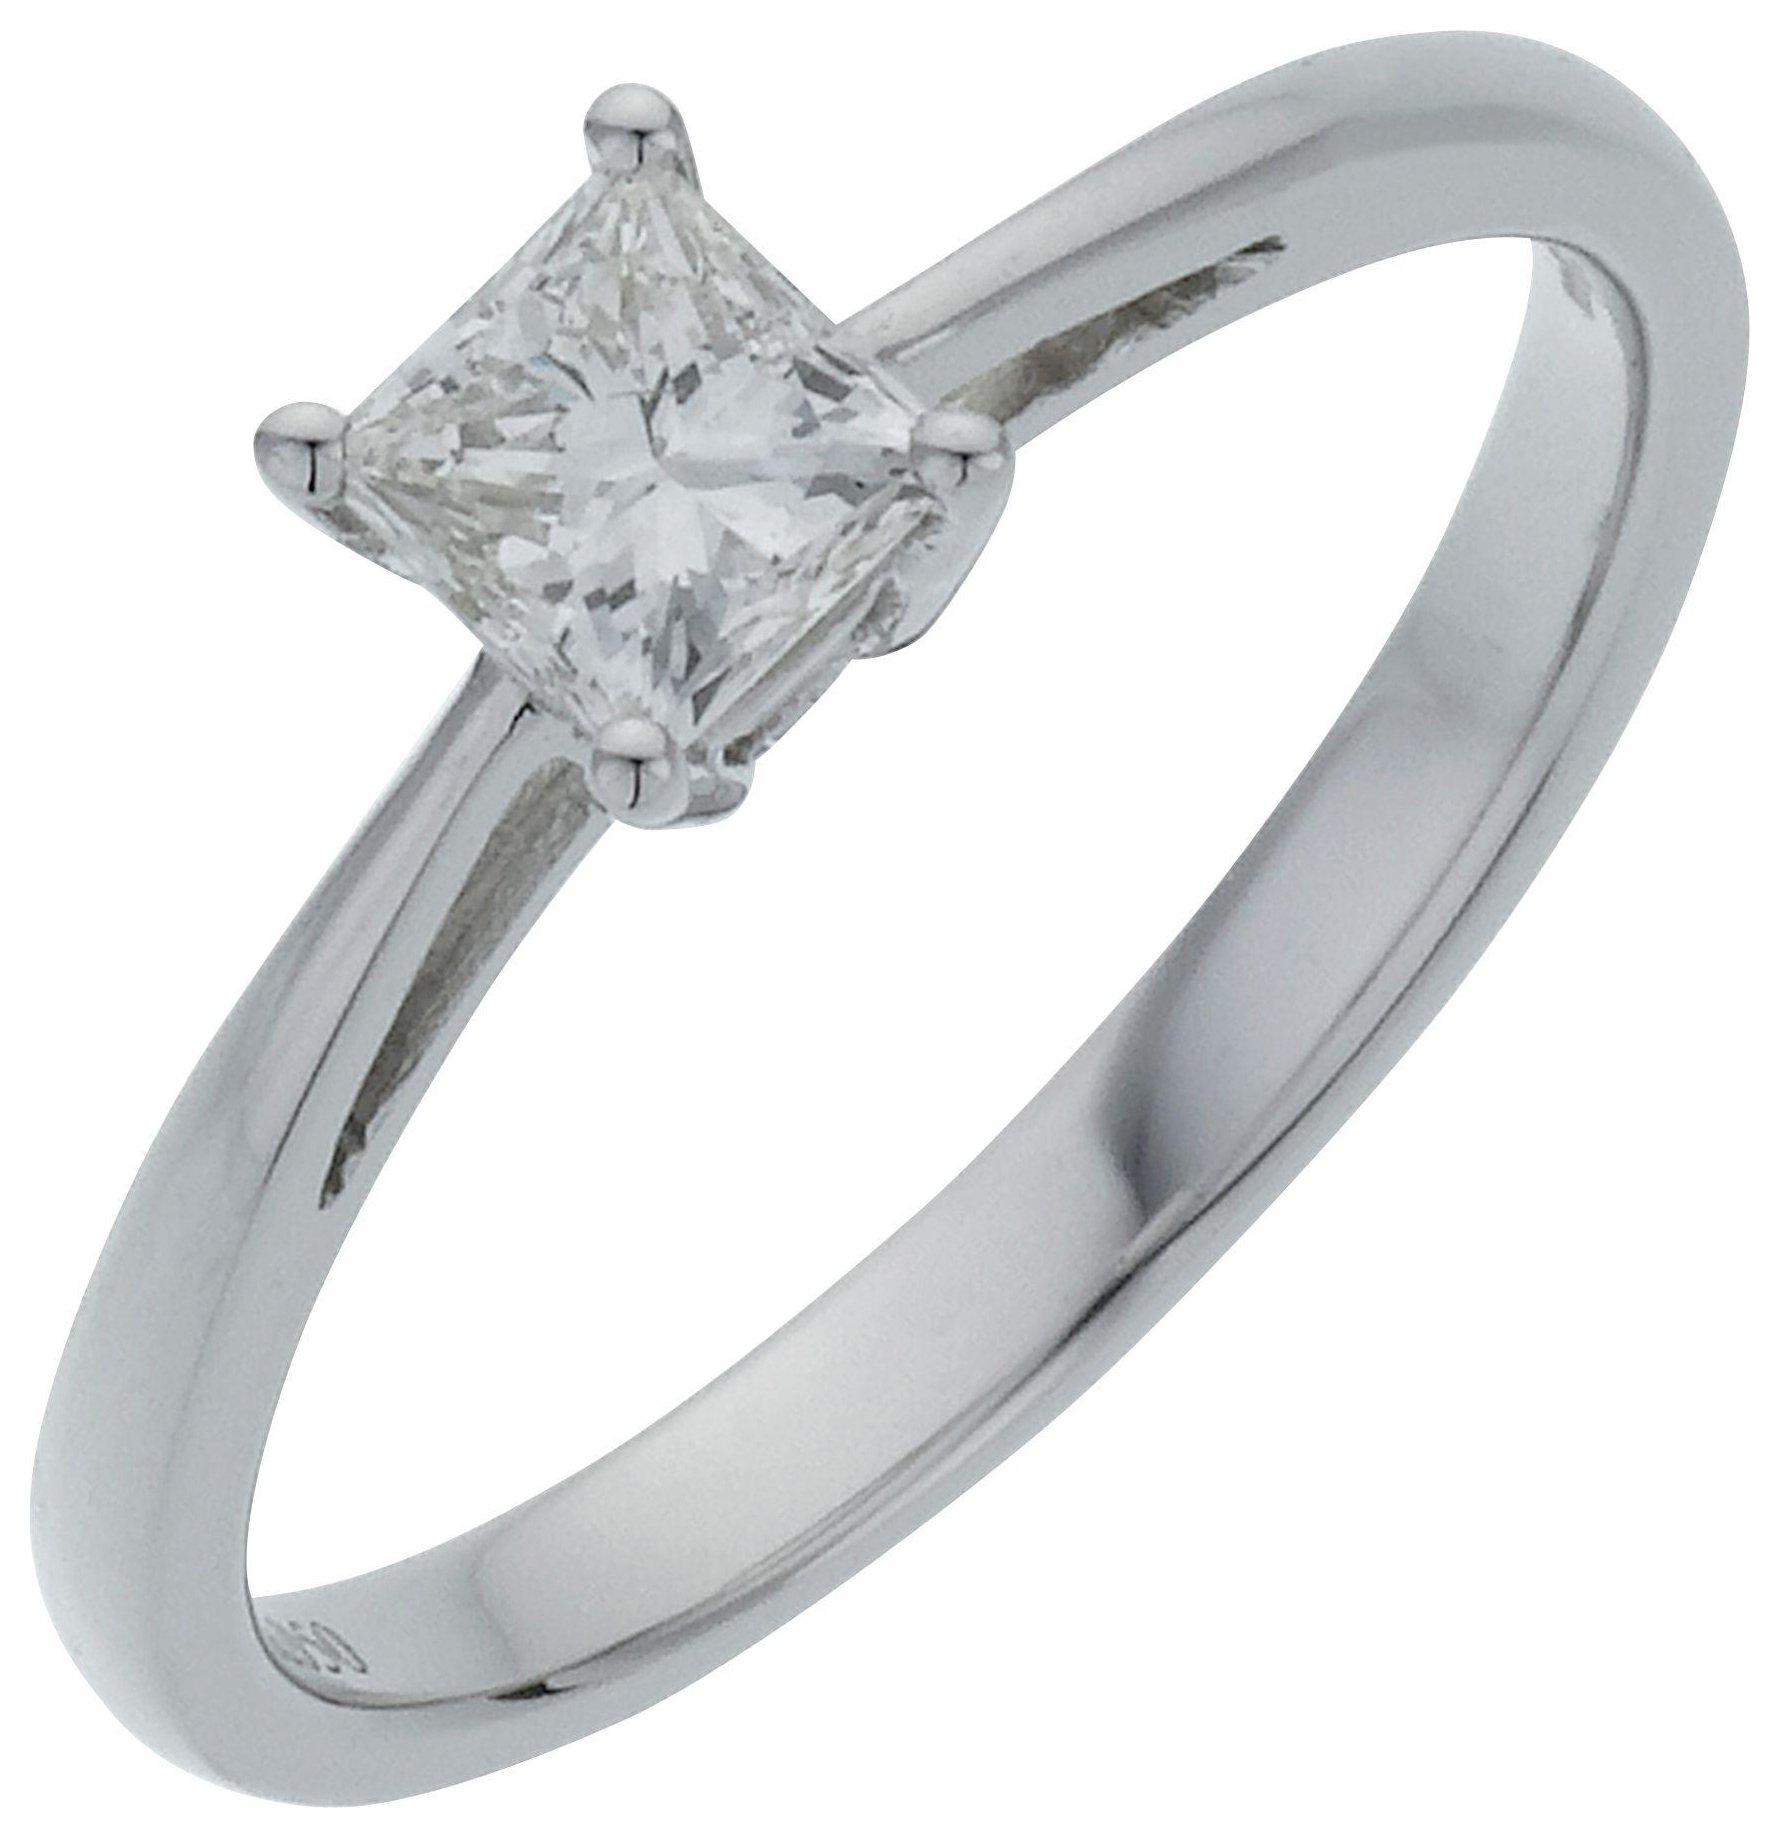 18 Carat White Gold 05 Carat Diamond - Princess Cut Diamond - Ring - W